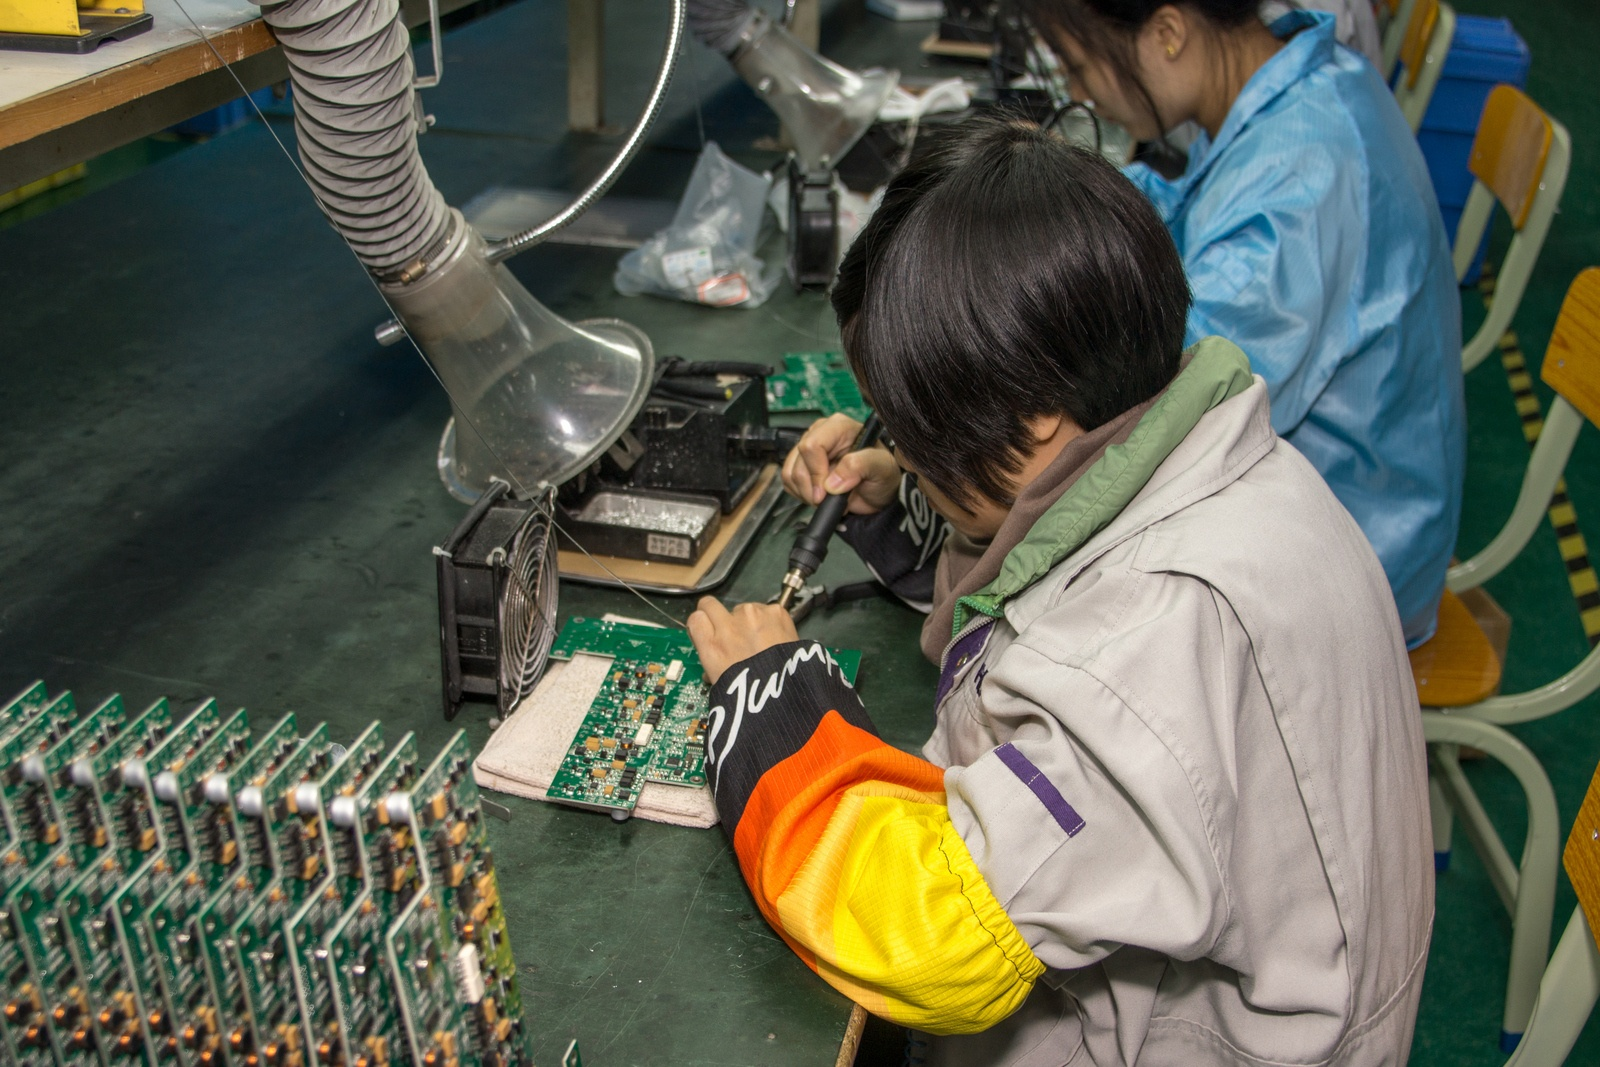 Китай. Завод устройств для «Умного дома». Учимся и учим - 33